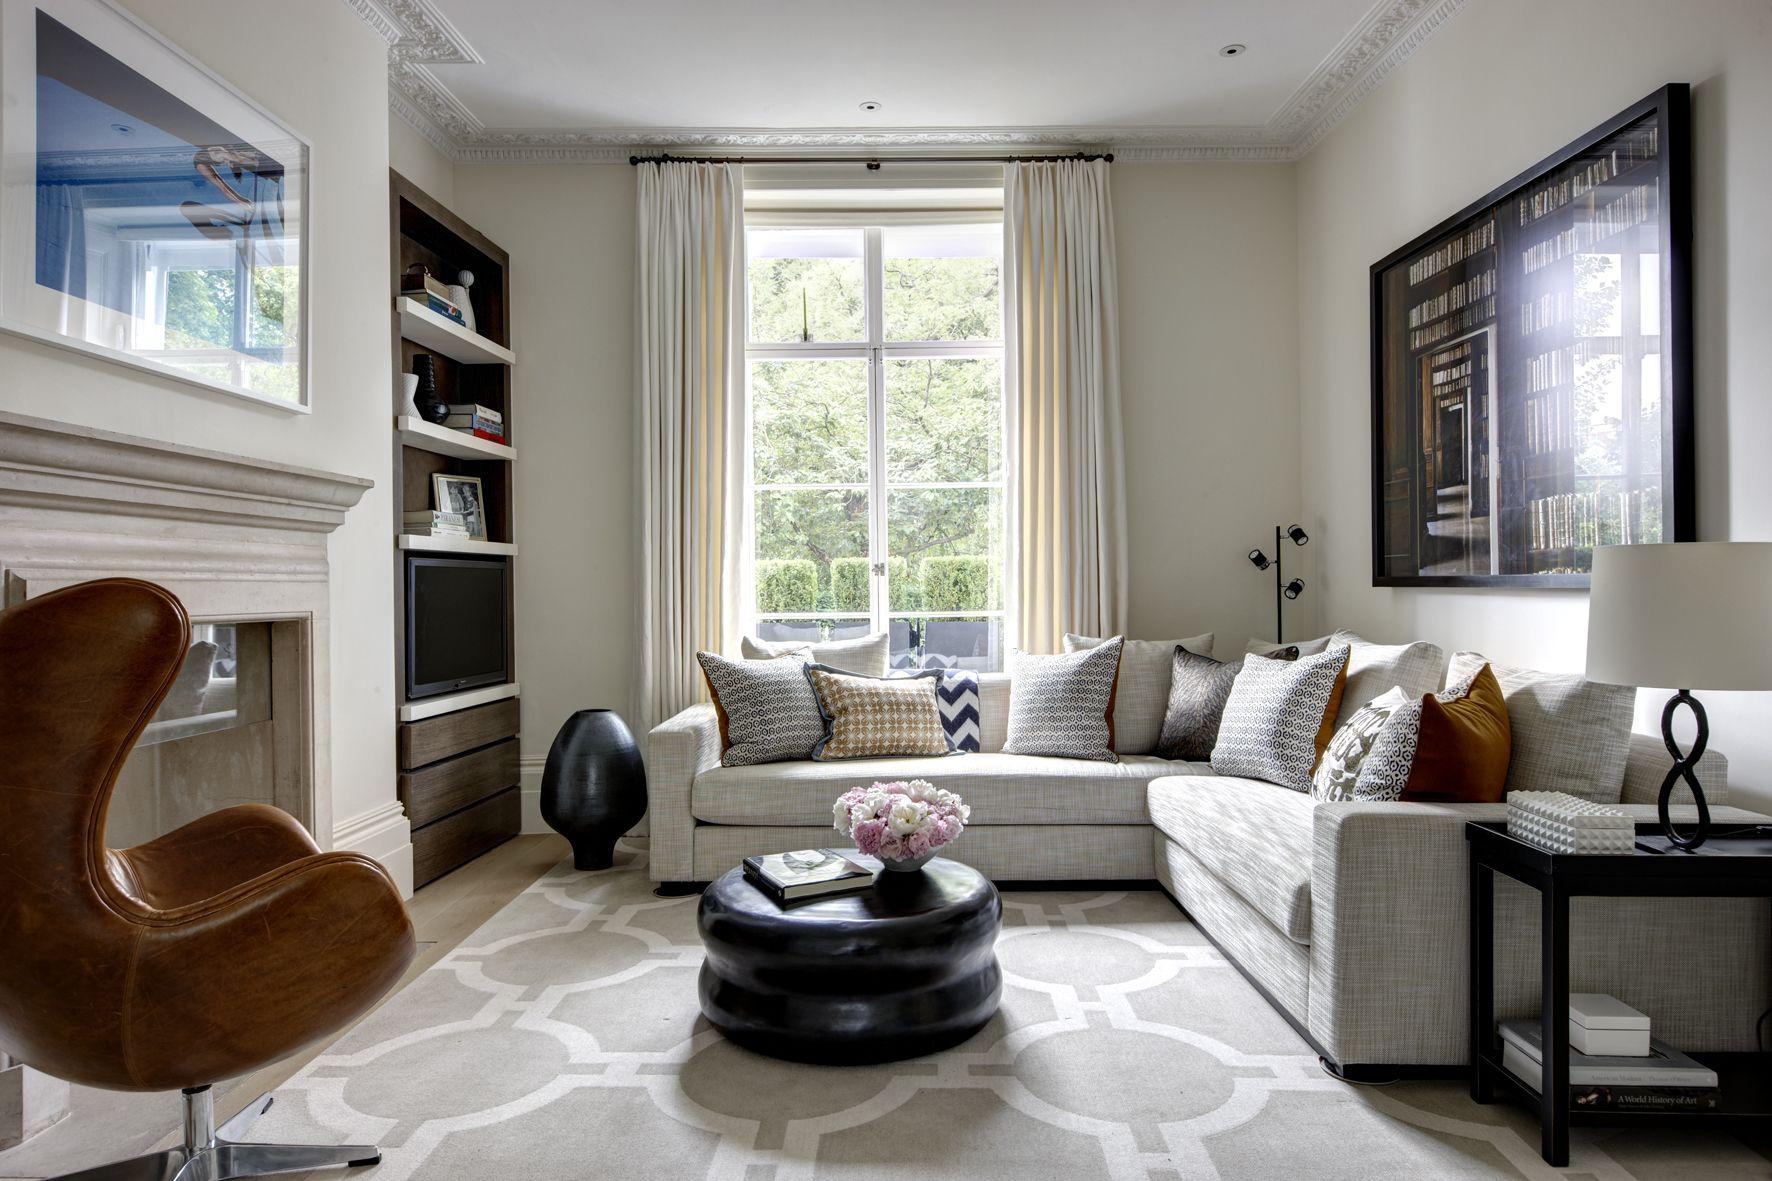 Wwwhelengreendesign © Helen Green Designhome Furniture Adorable Need Help Designing My Living Room 2018